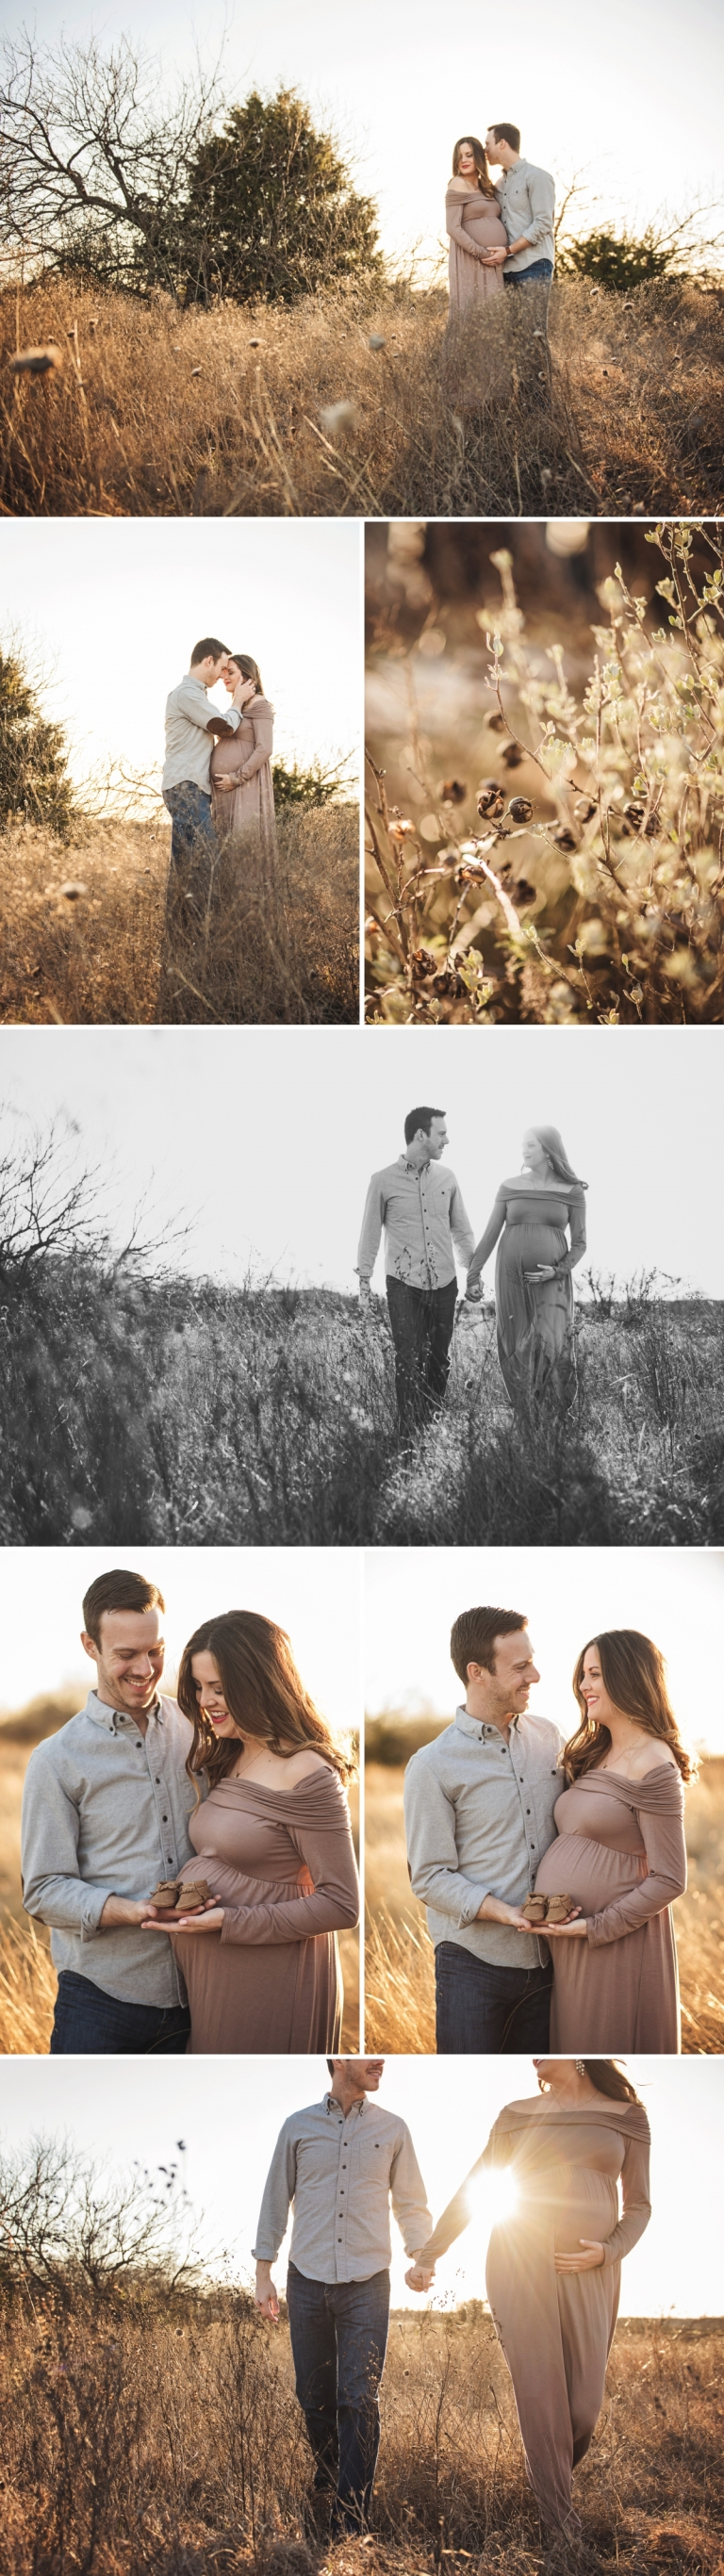 Dallas and Denton Maternity Photographer